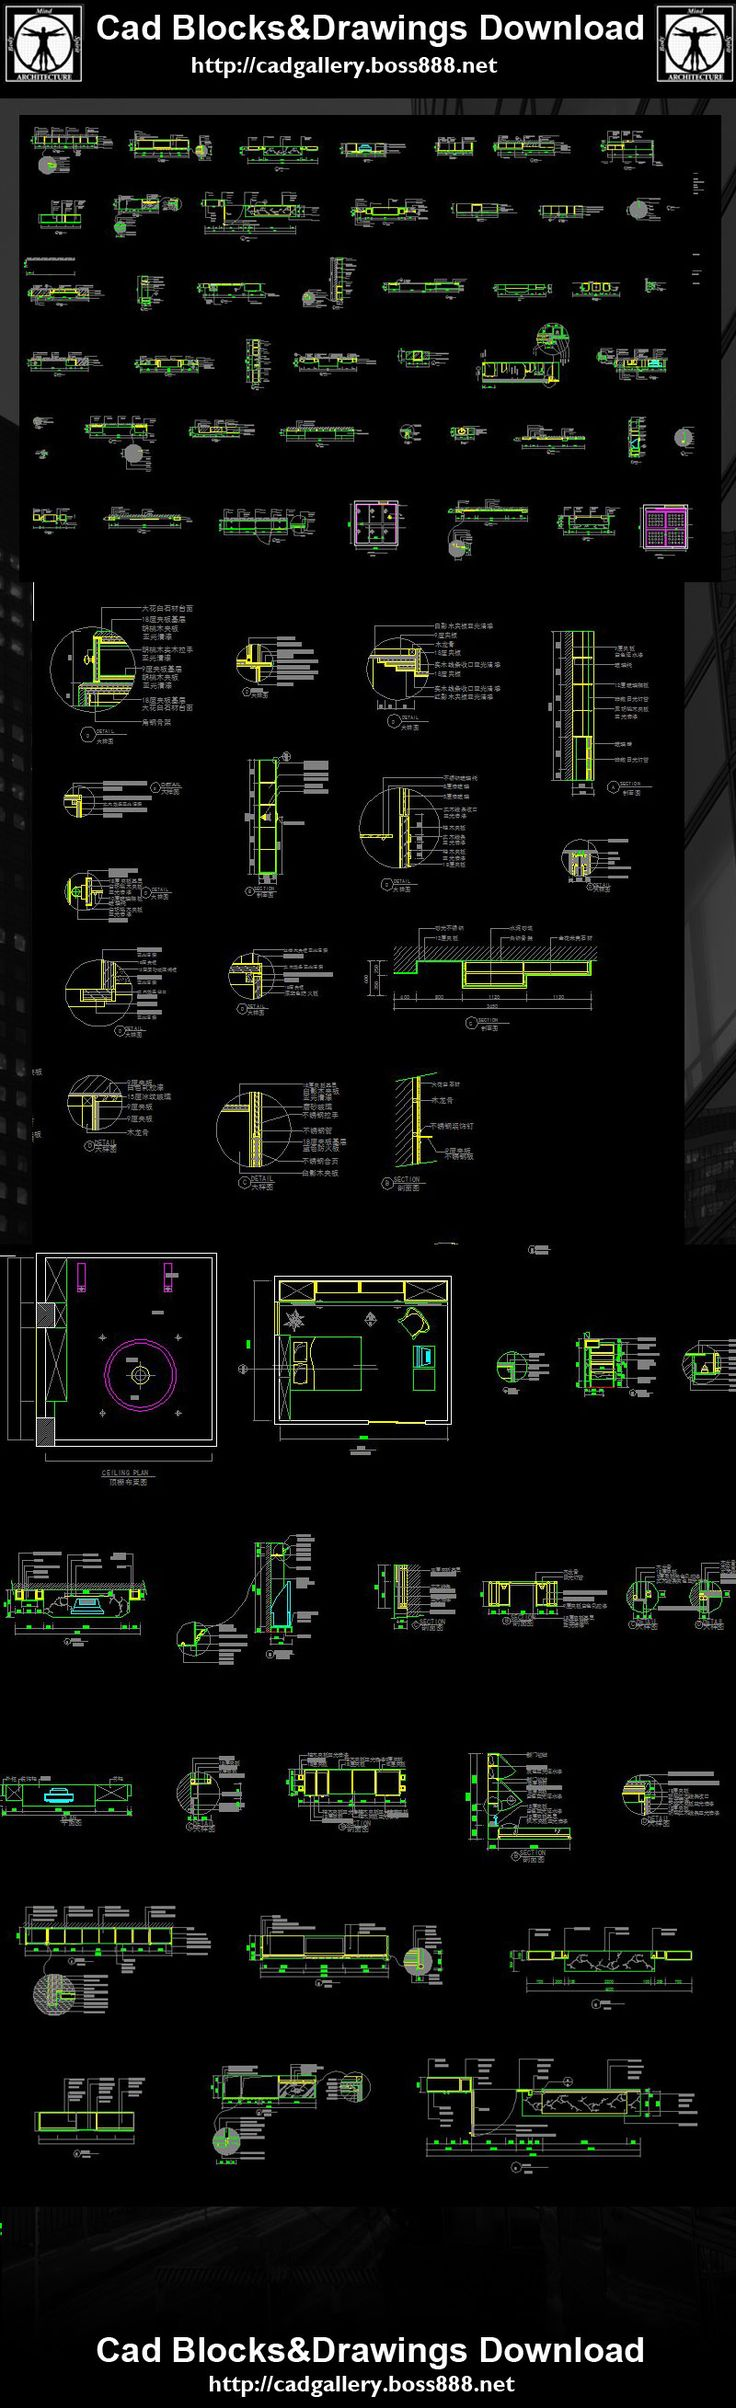 Interior Design Details,Interior Design Autocad drawings downloadable in dwg  files,Architecture & interior